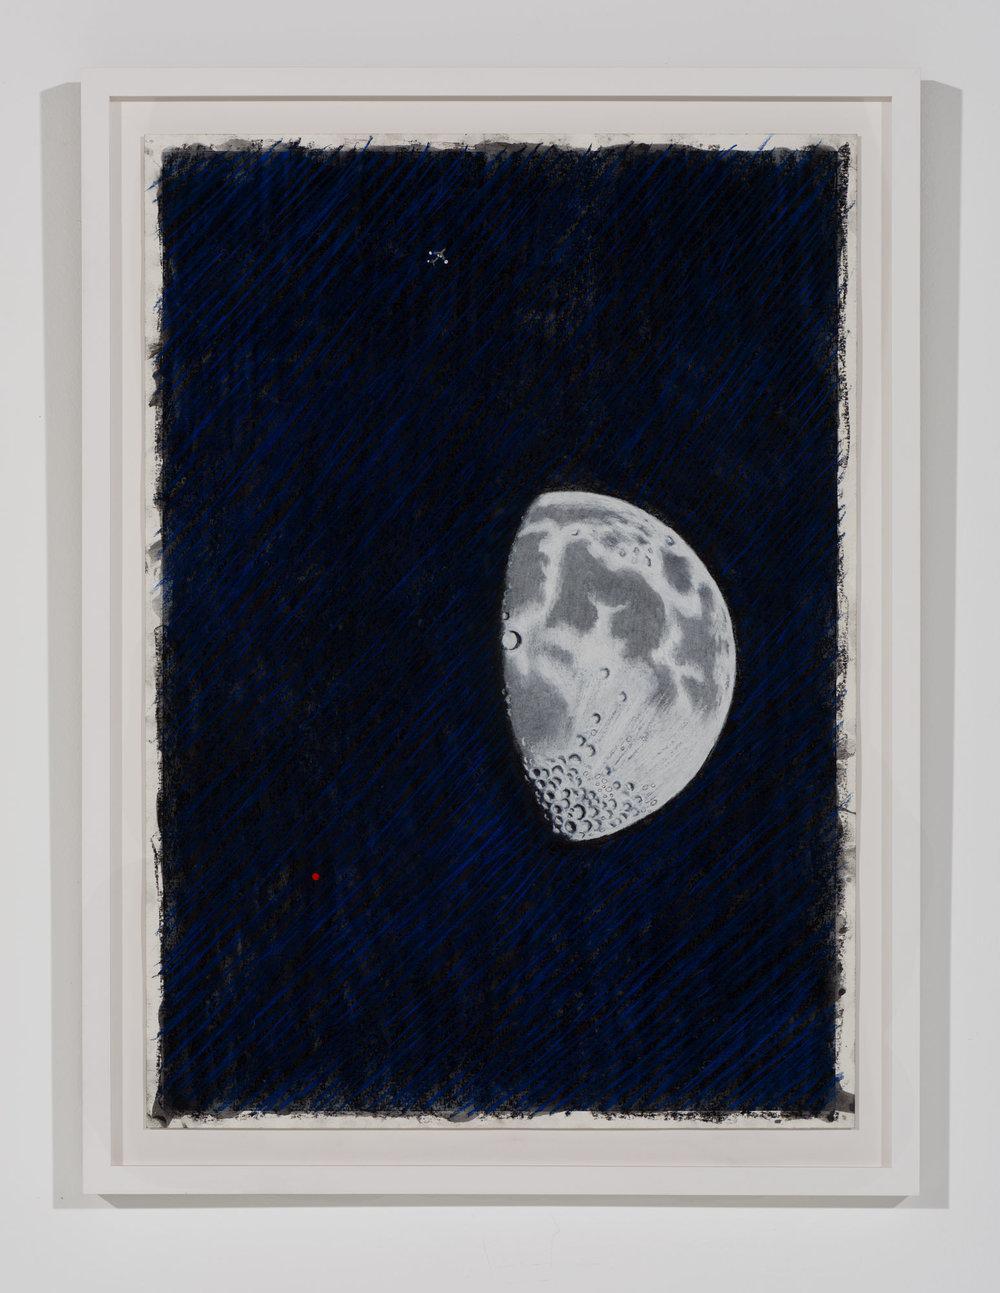 The Moon 8.20.18